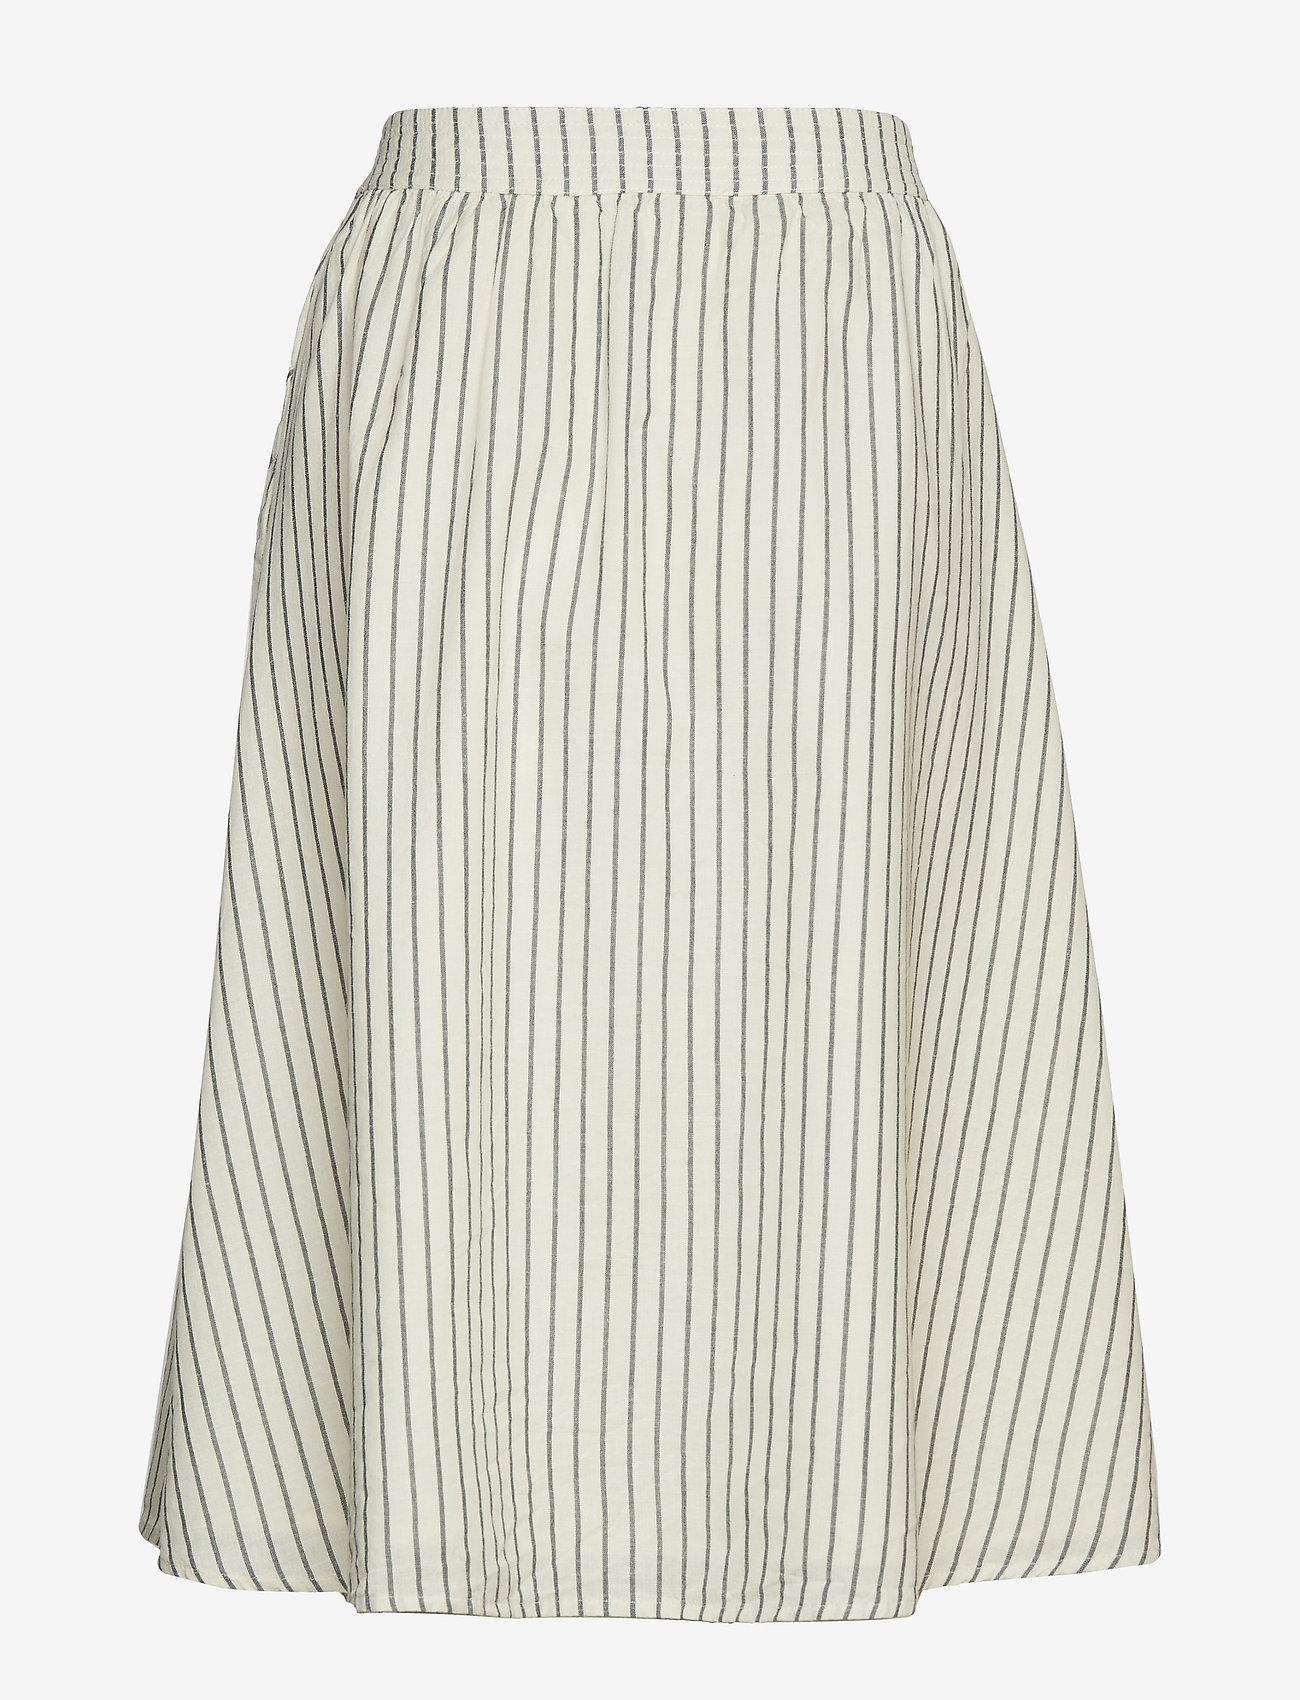 Esprit Casual Skirts Light Woven -